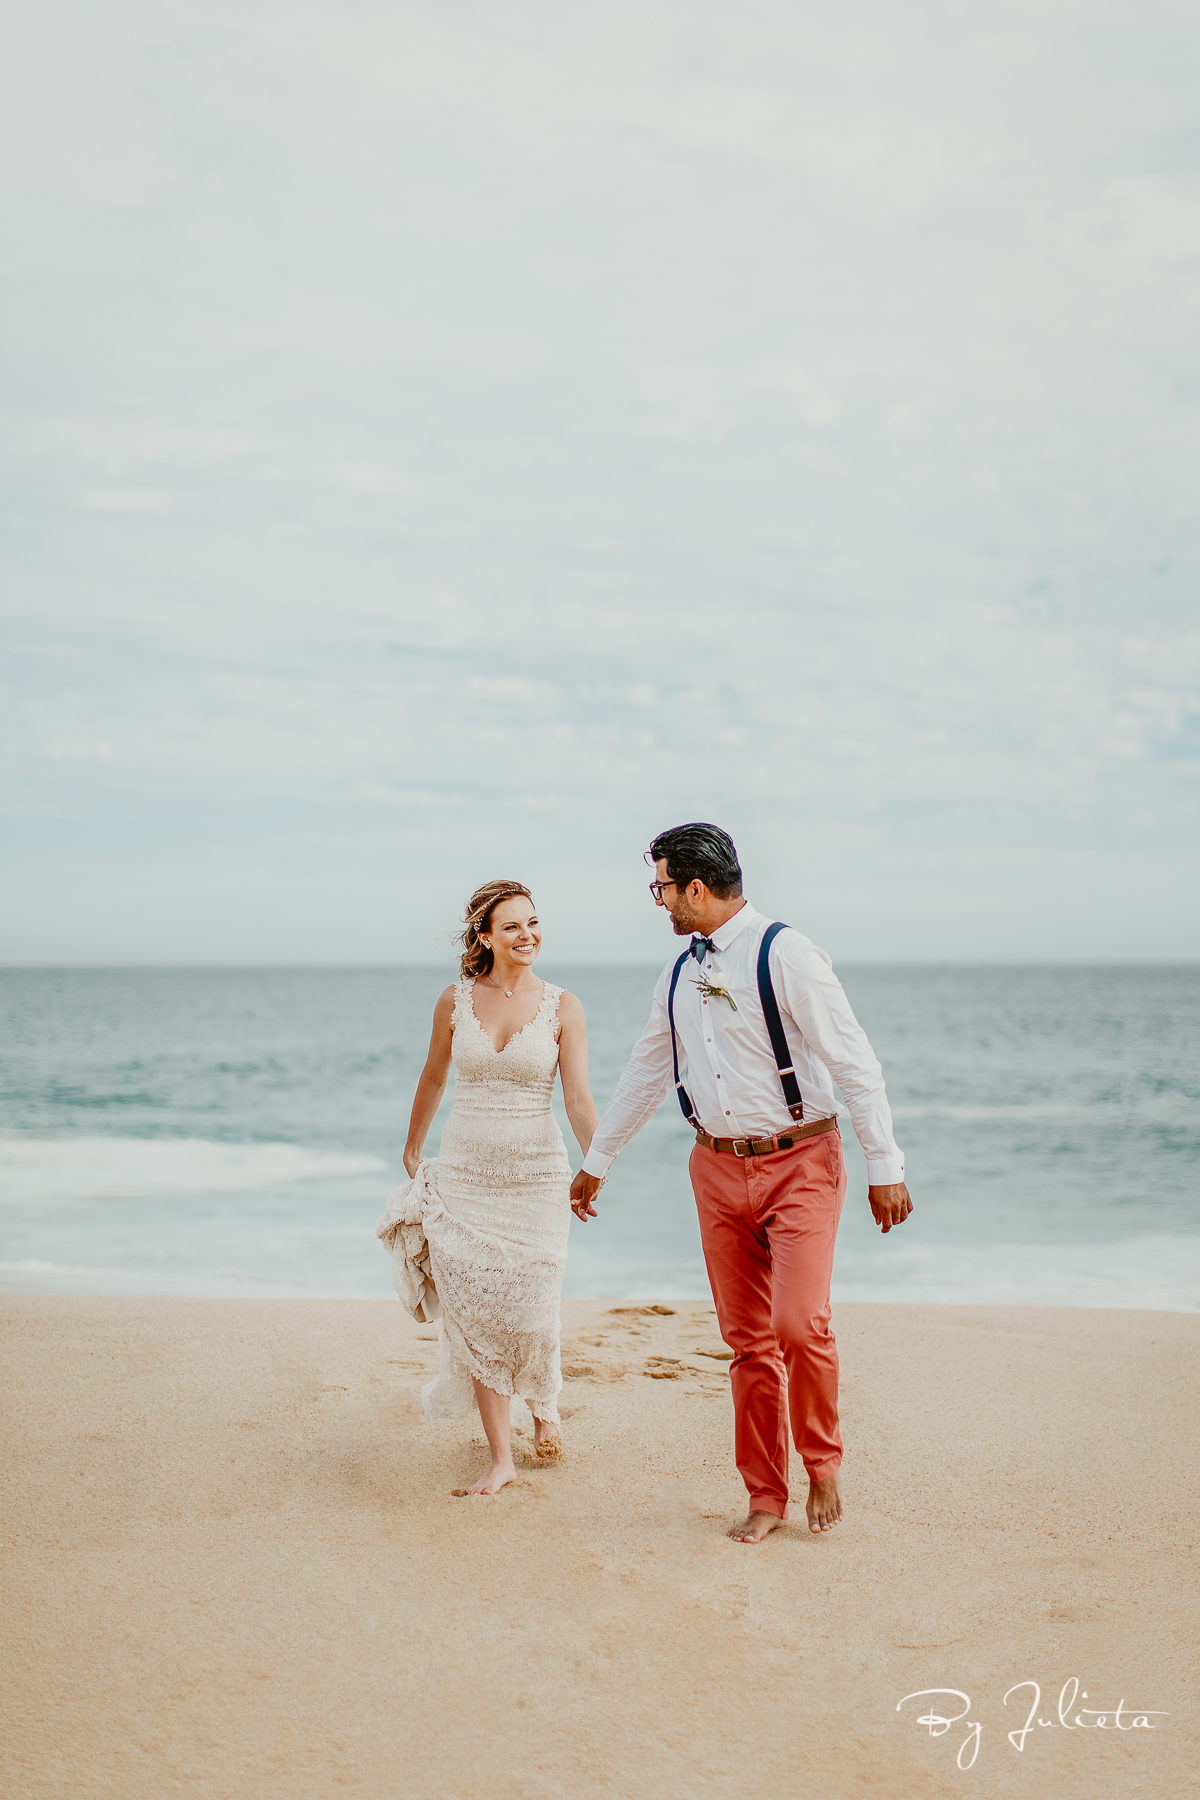 Los Tamarindos Wedding. D+L. Julieta Amezcua Photography. (6 of 25).jpg